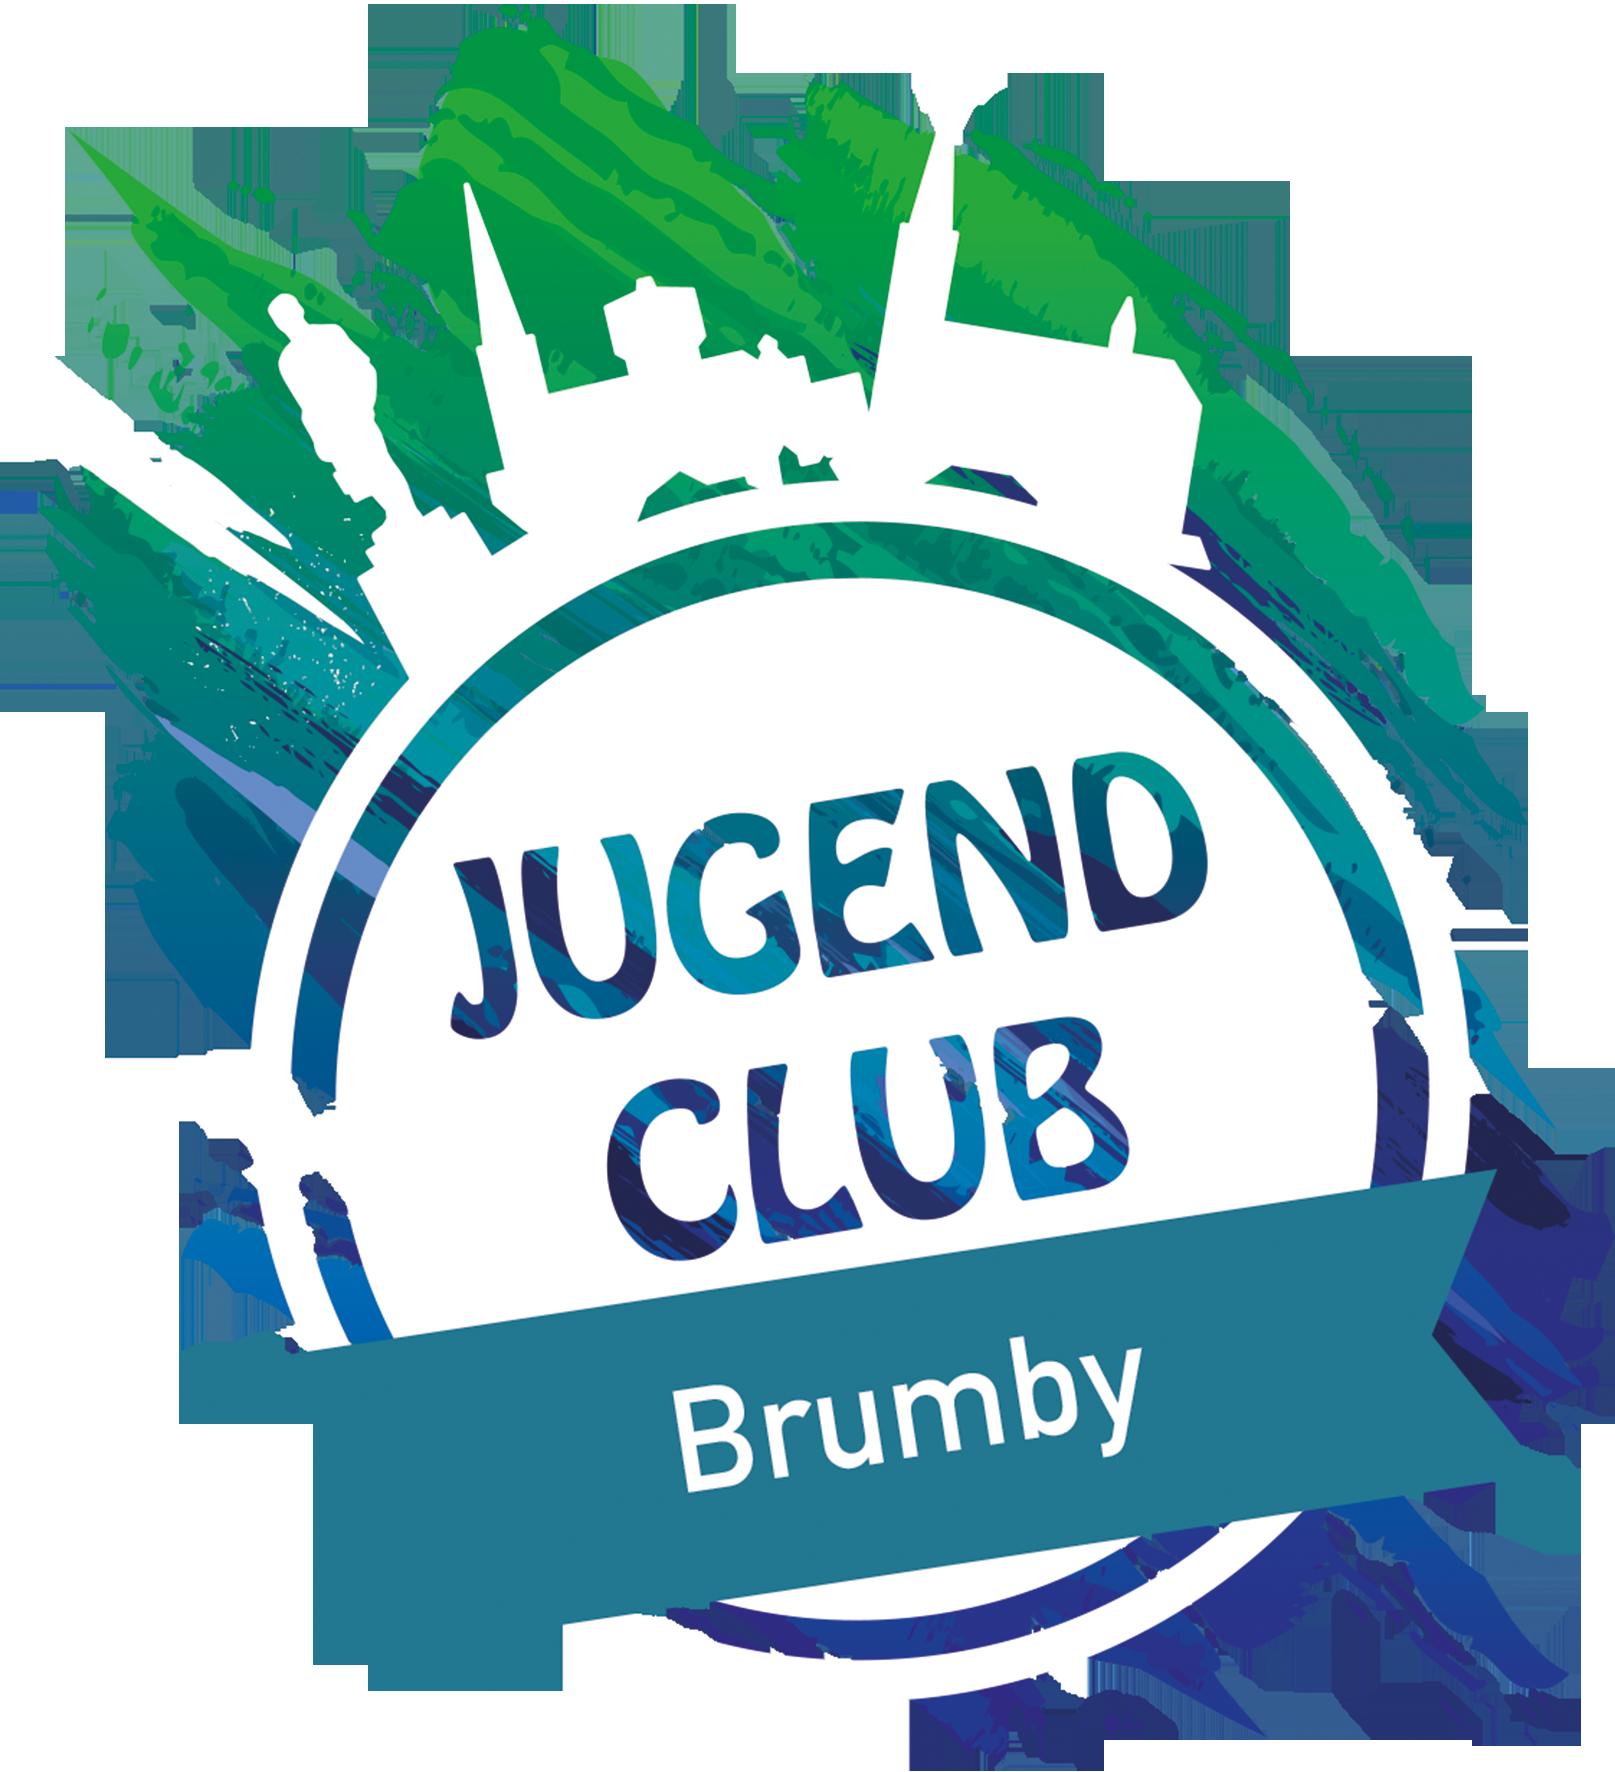 Jugendclub Brumby